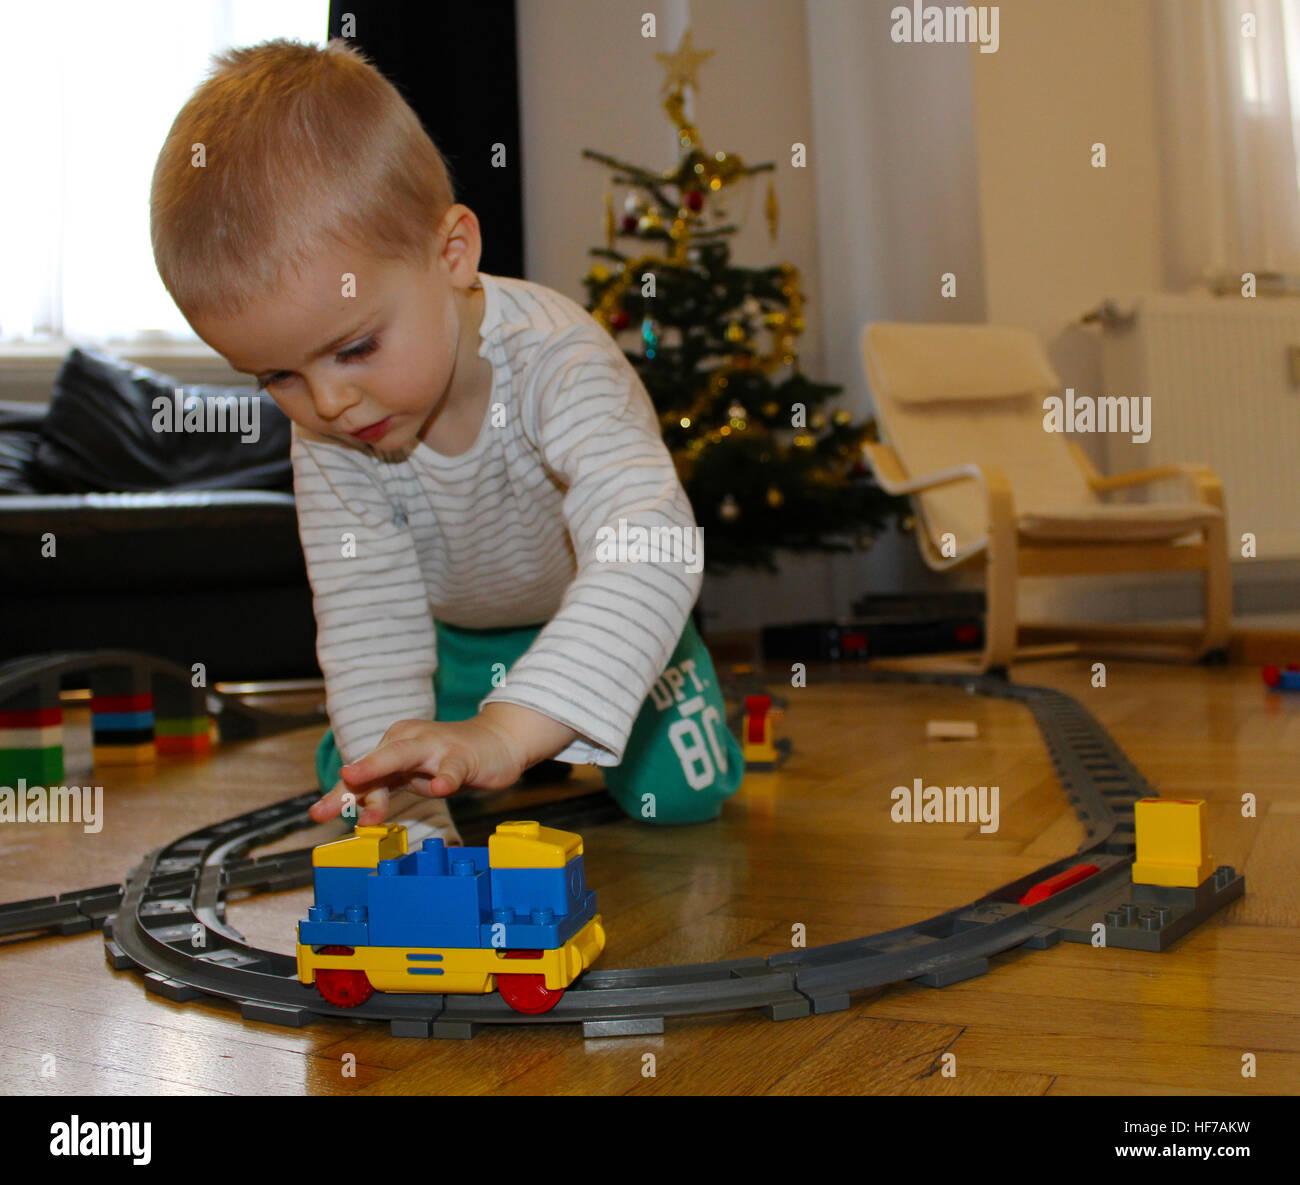 child lego stockfotos child lego bilder seite 10 alamy. Black Bedroom Furniture Sets. Home Design Ideas